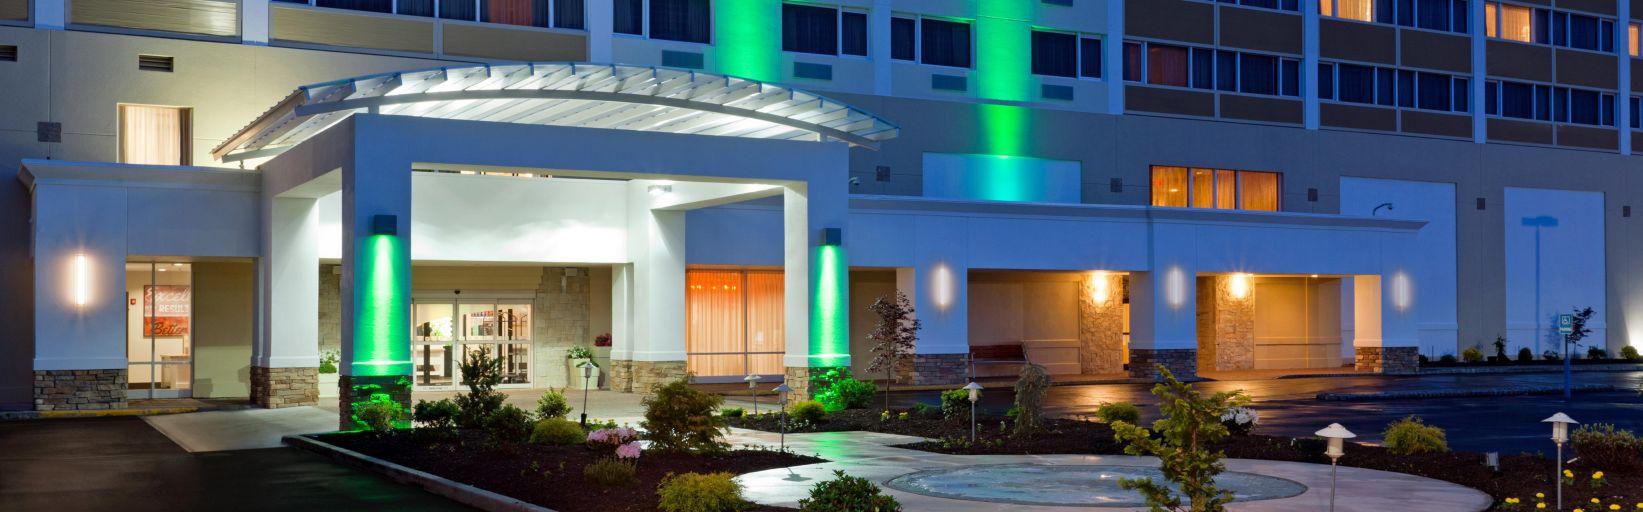 Holiday Inn Clark Near Woodbridge Nj Kean University